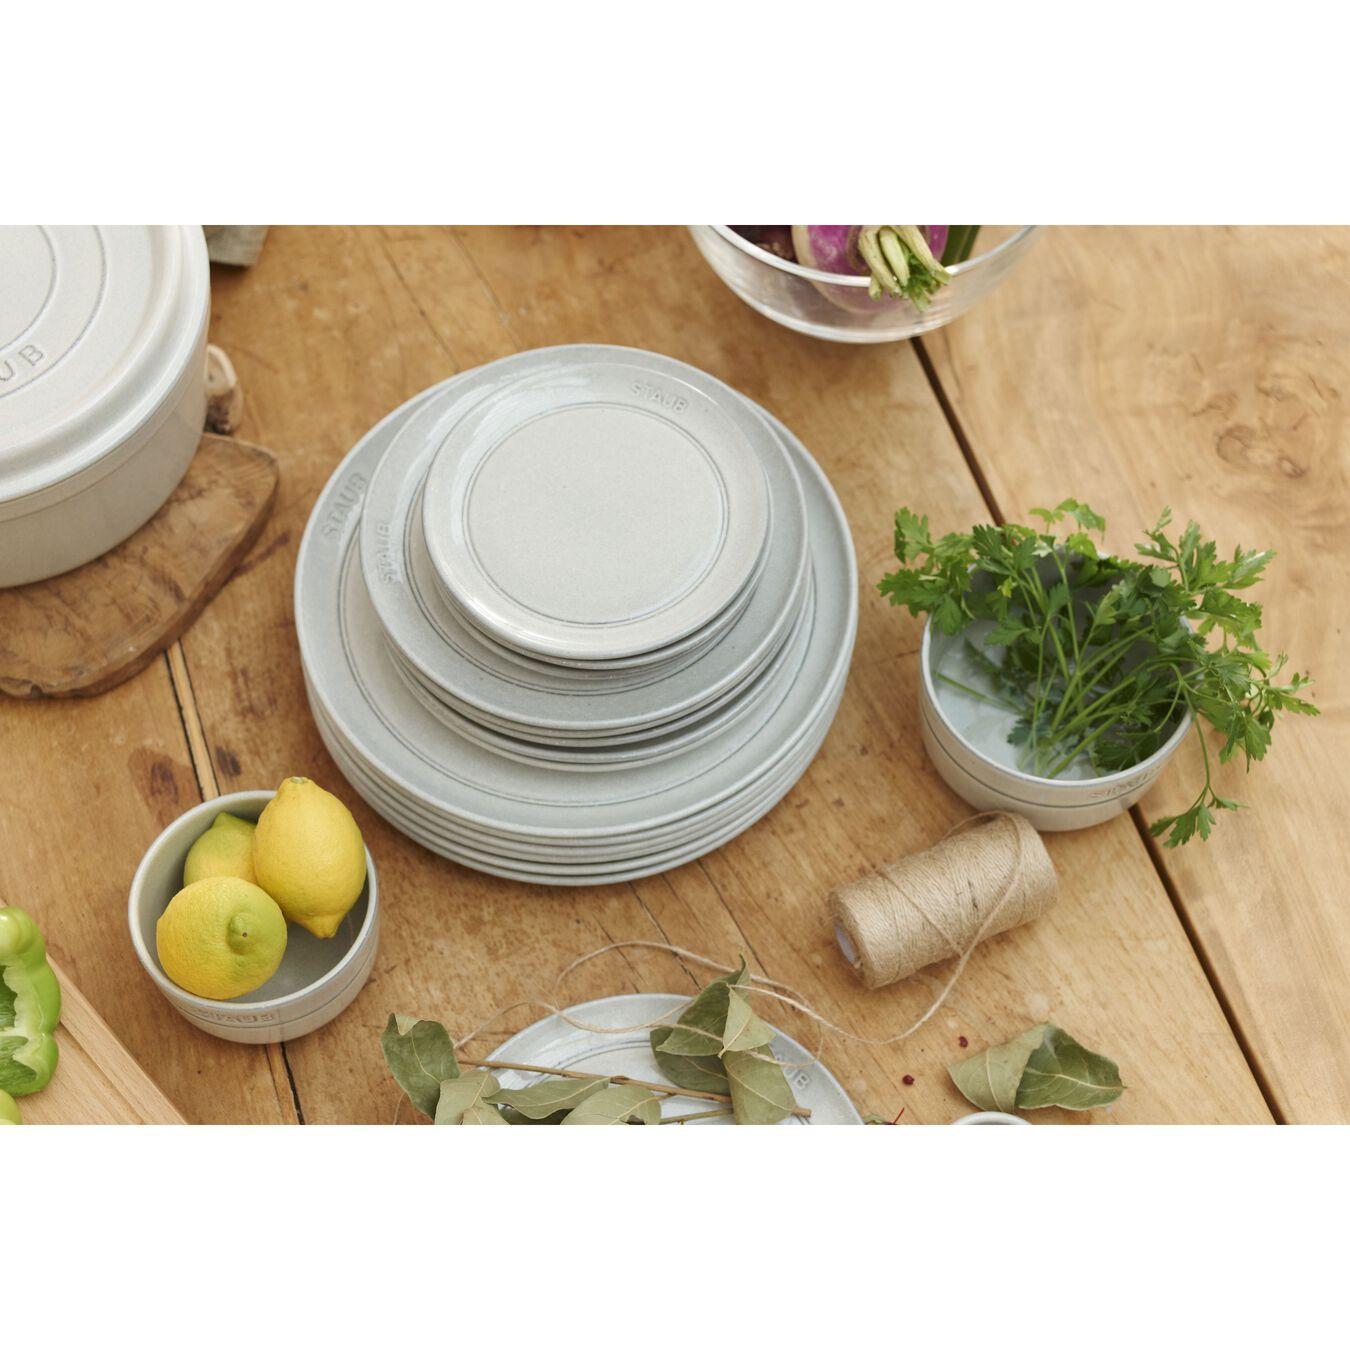 15 cm Ceramic round Assiette flat, White Truffle,,large 3